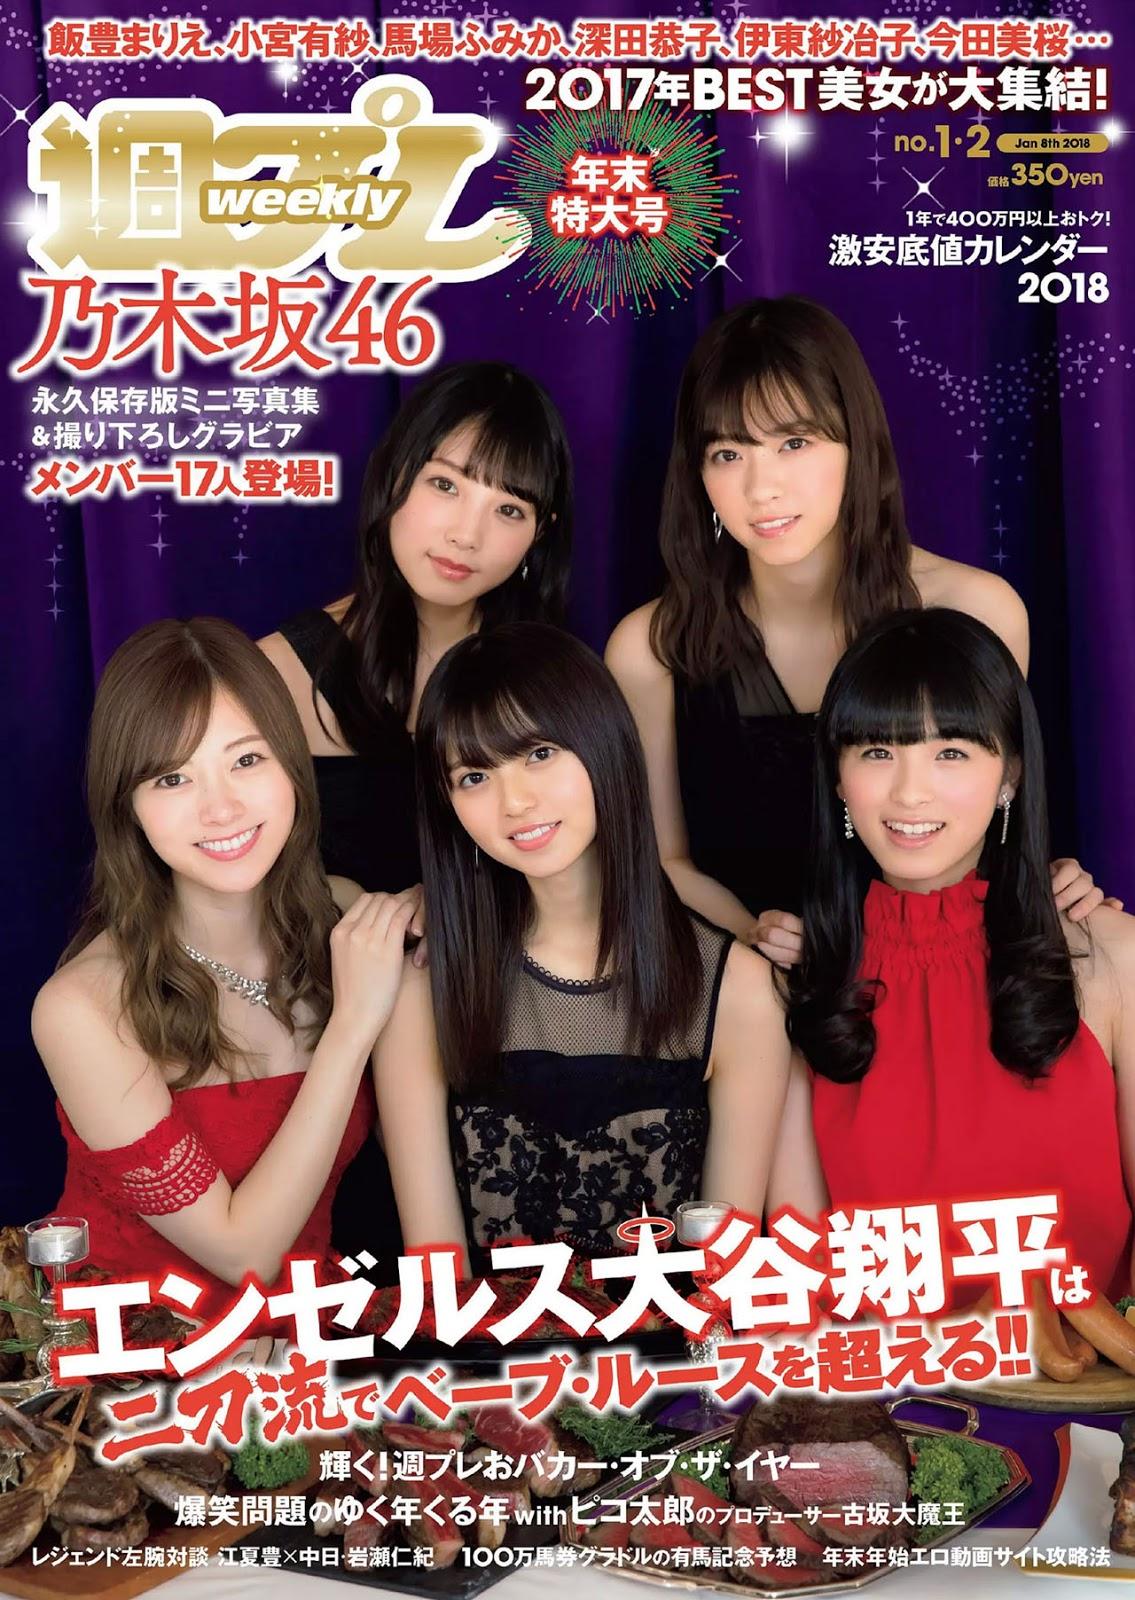 Nogizaka46 乃木坂46, Weekly Playboy 2018.01.08 No.01 (週刊プレイボーイ 2017年1月8日号)